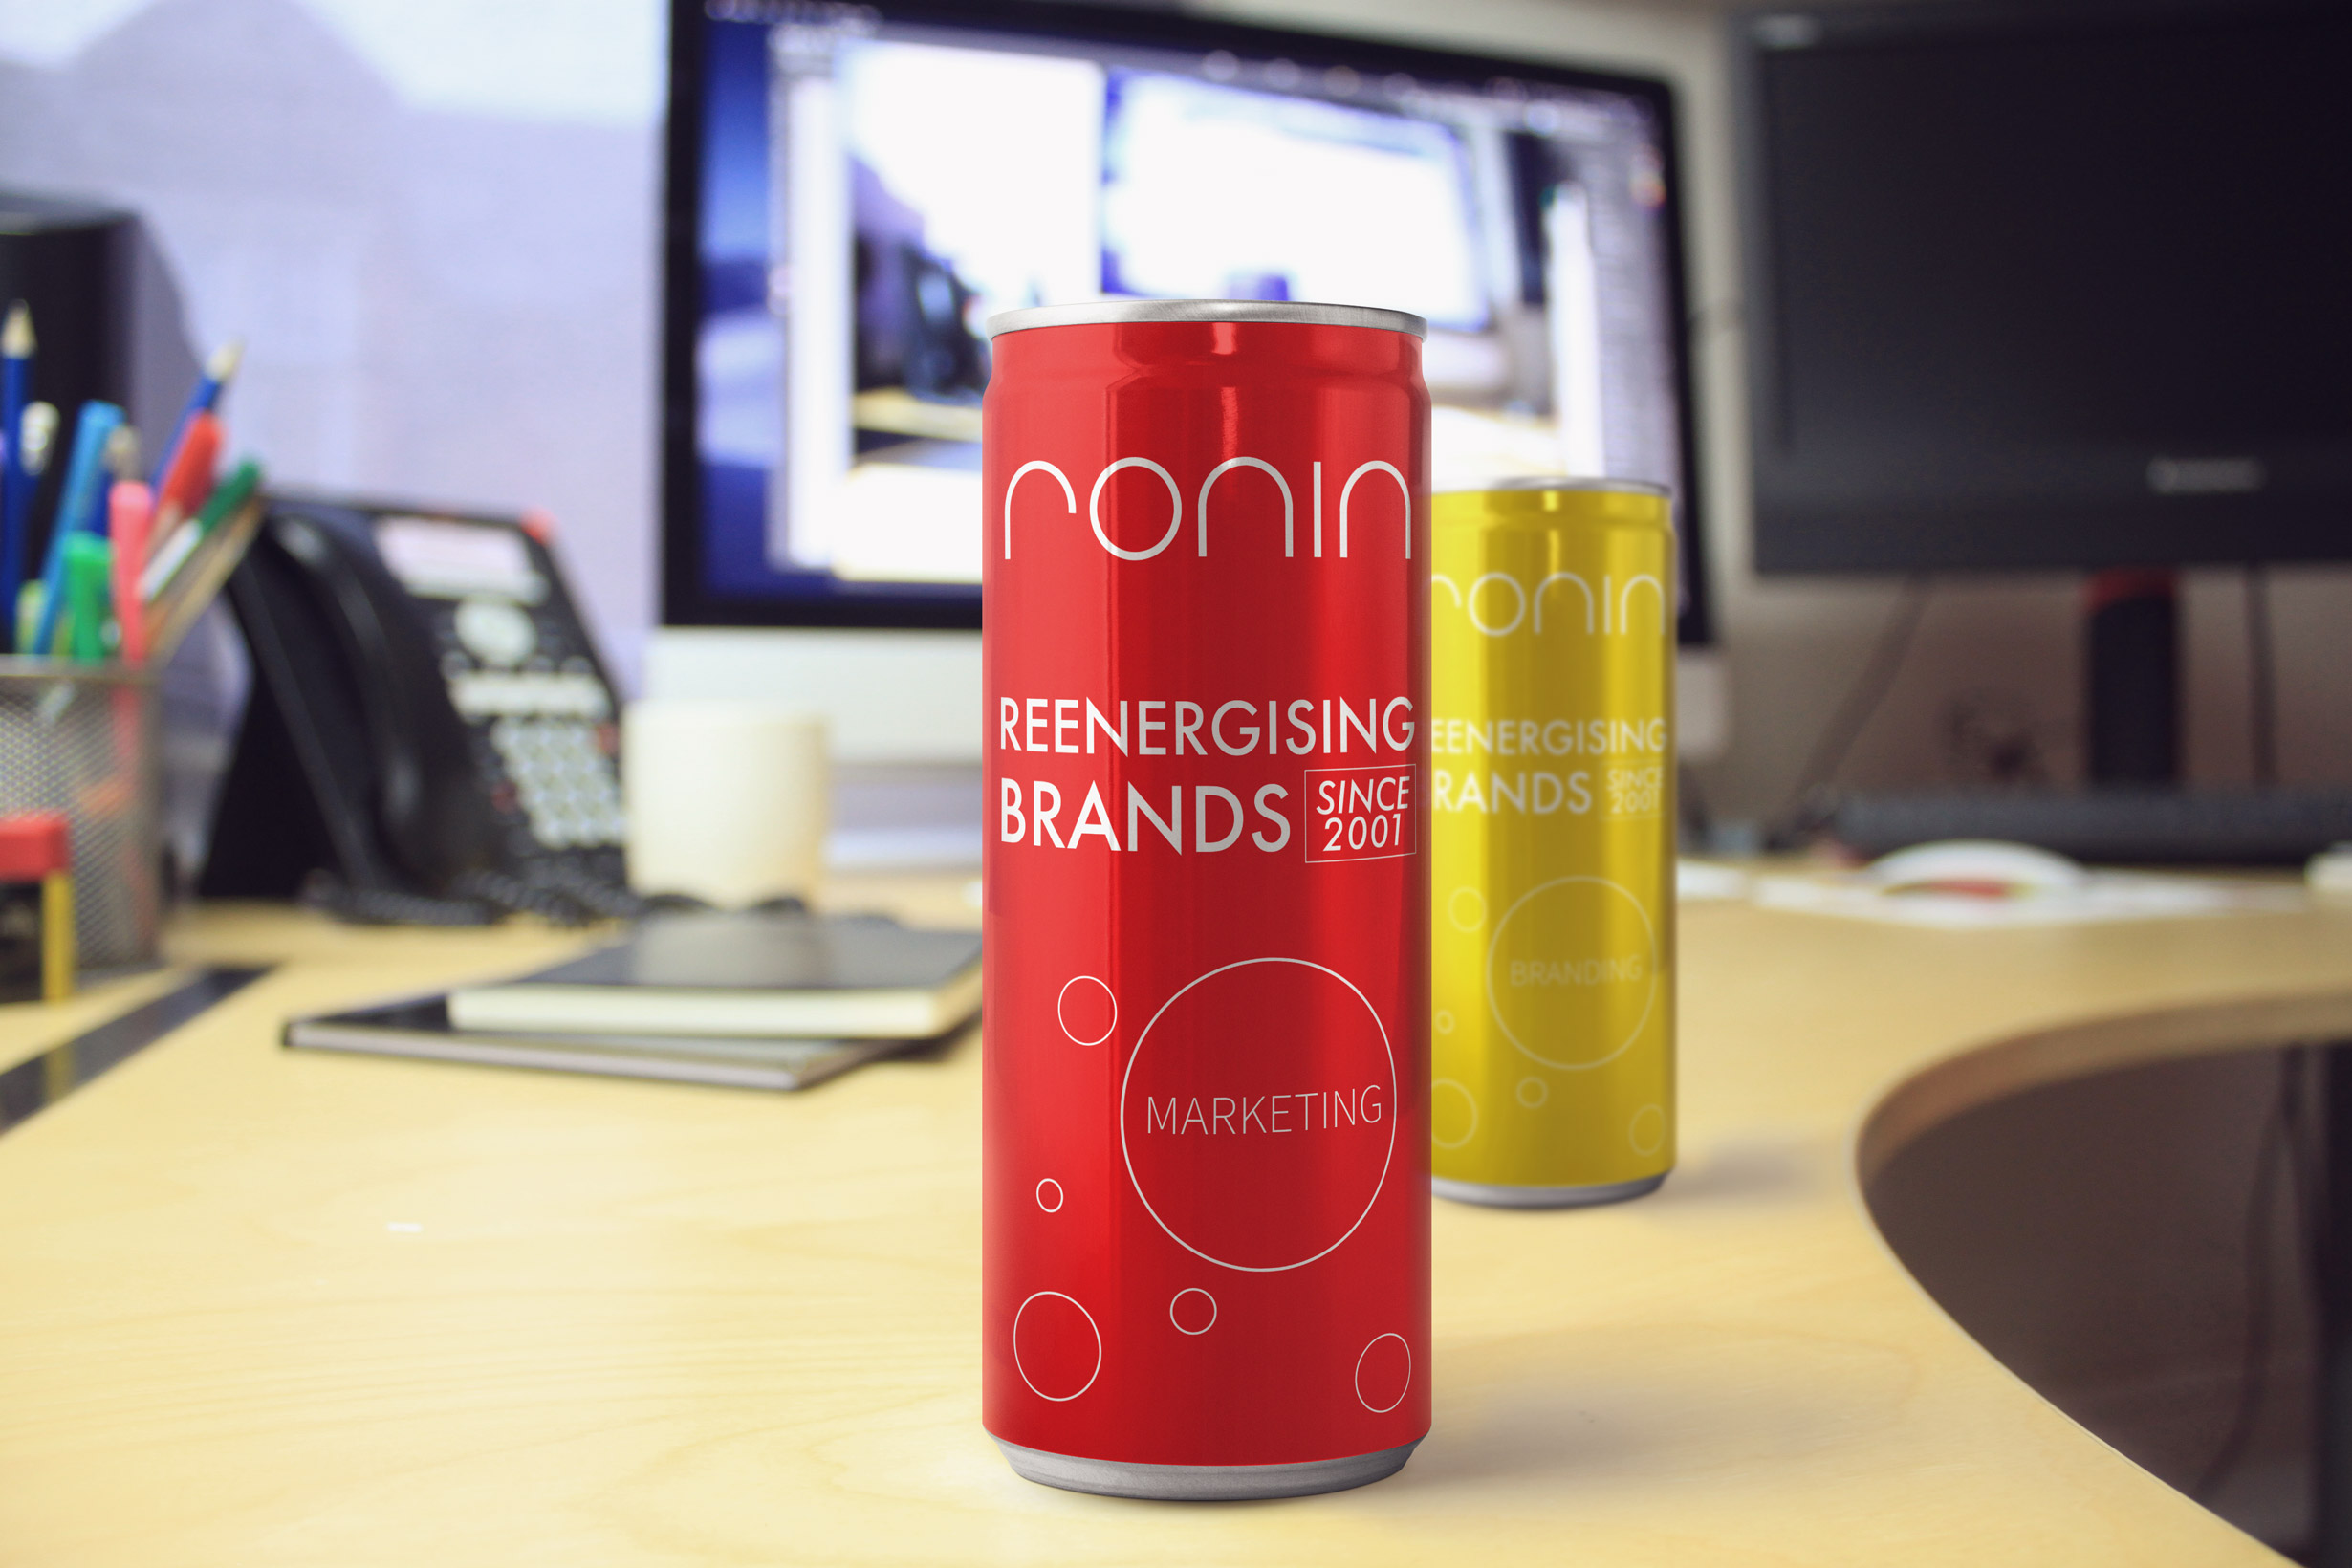 Reenergise brands